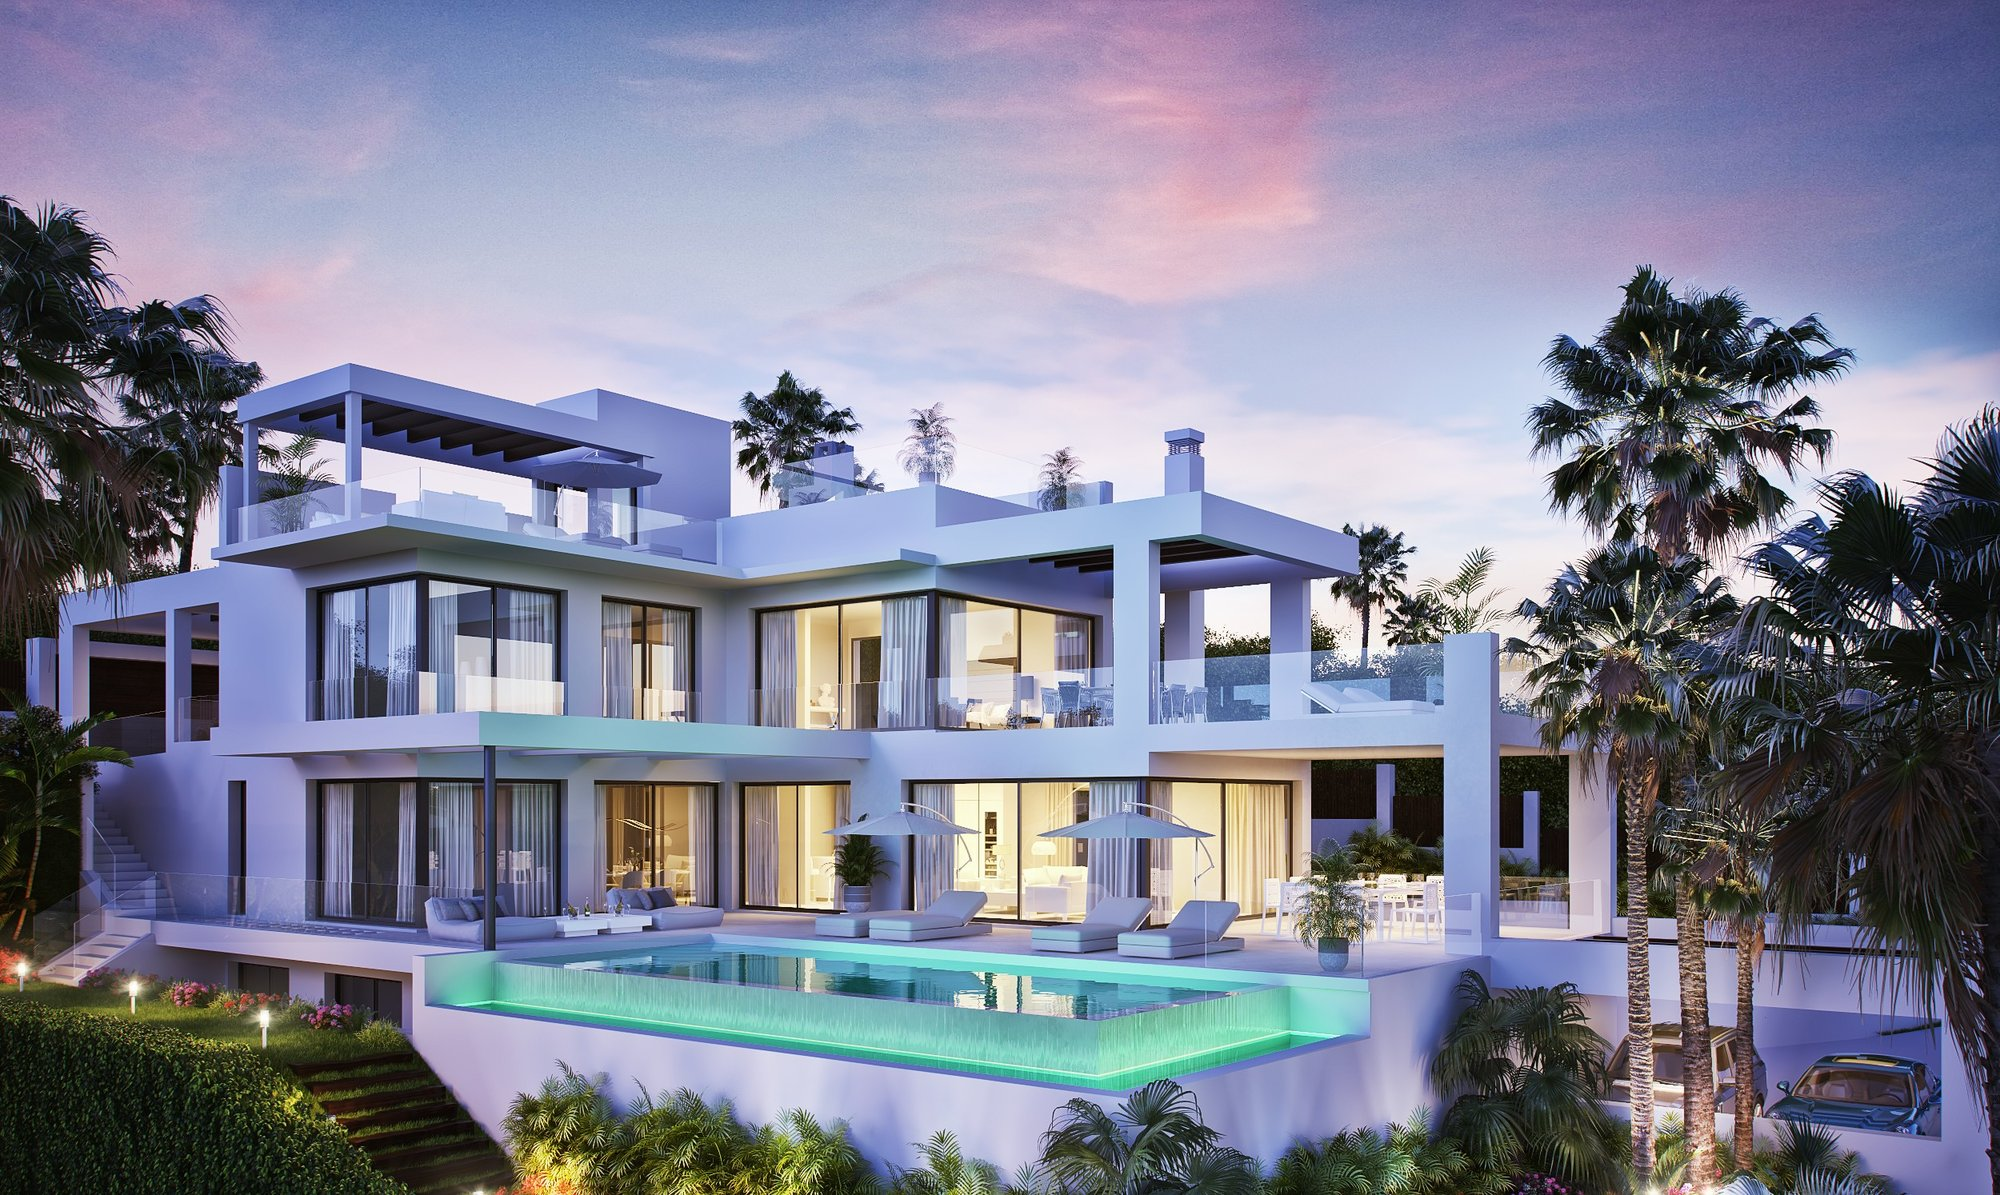 Villa till salu i Estepona, New Golden Mile